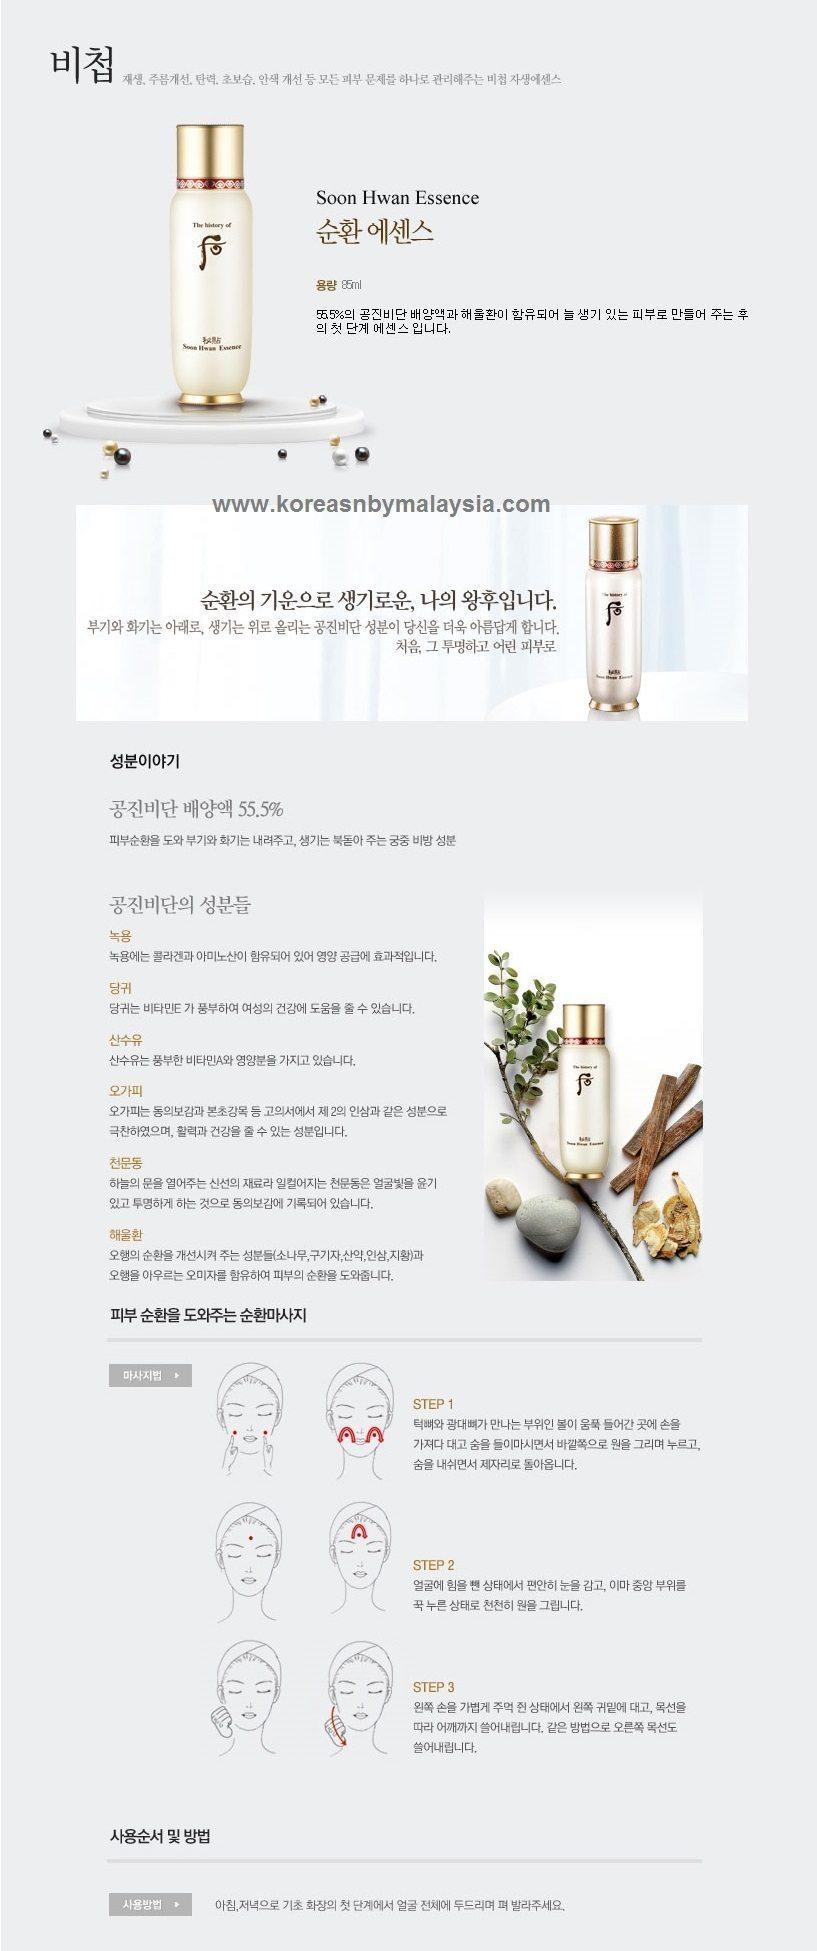 The History of Whoo Bichup Soon Hwan Essence 85 ml